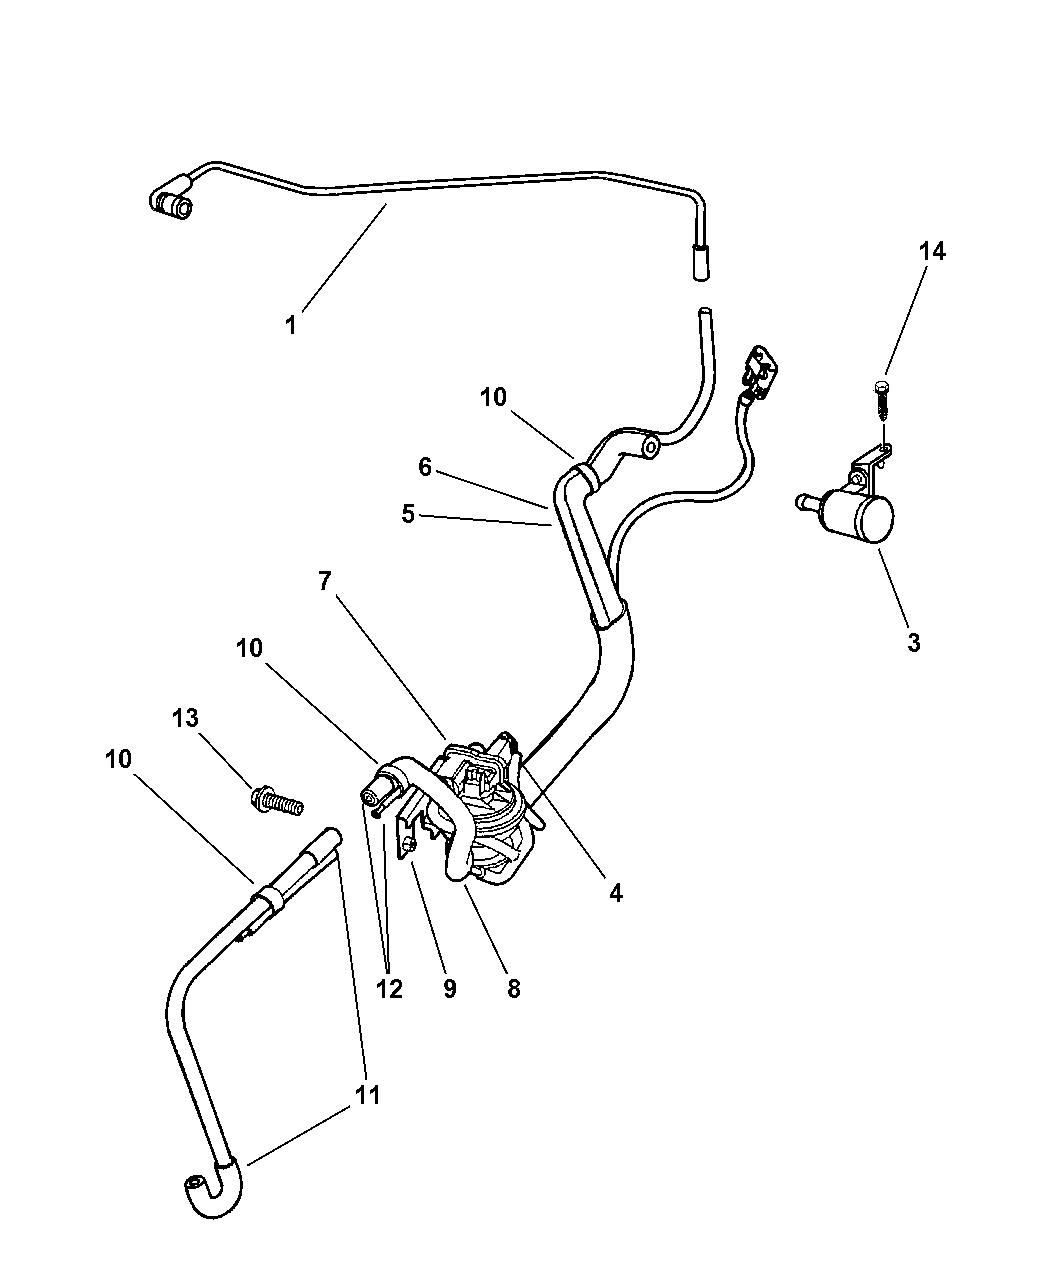 2000 chrysler town & country leak detection pump